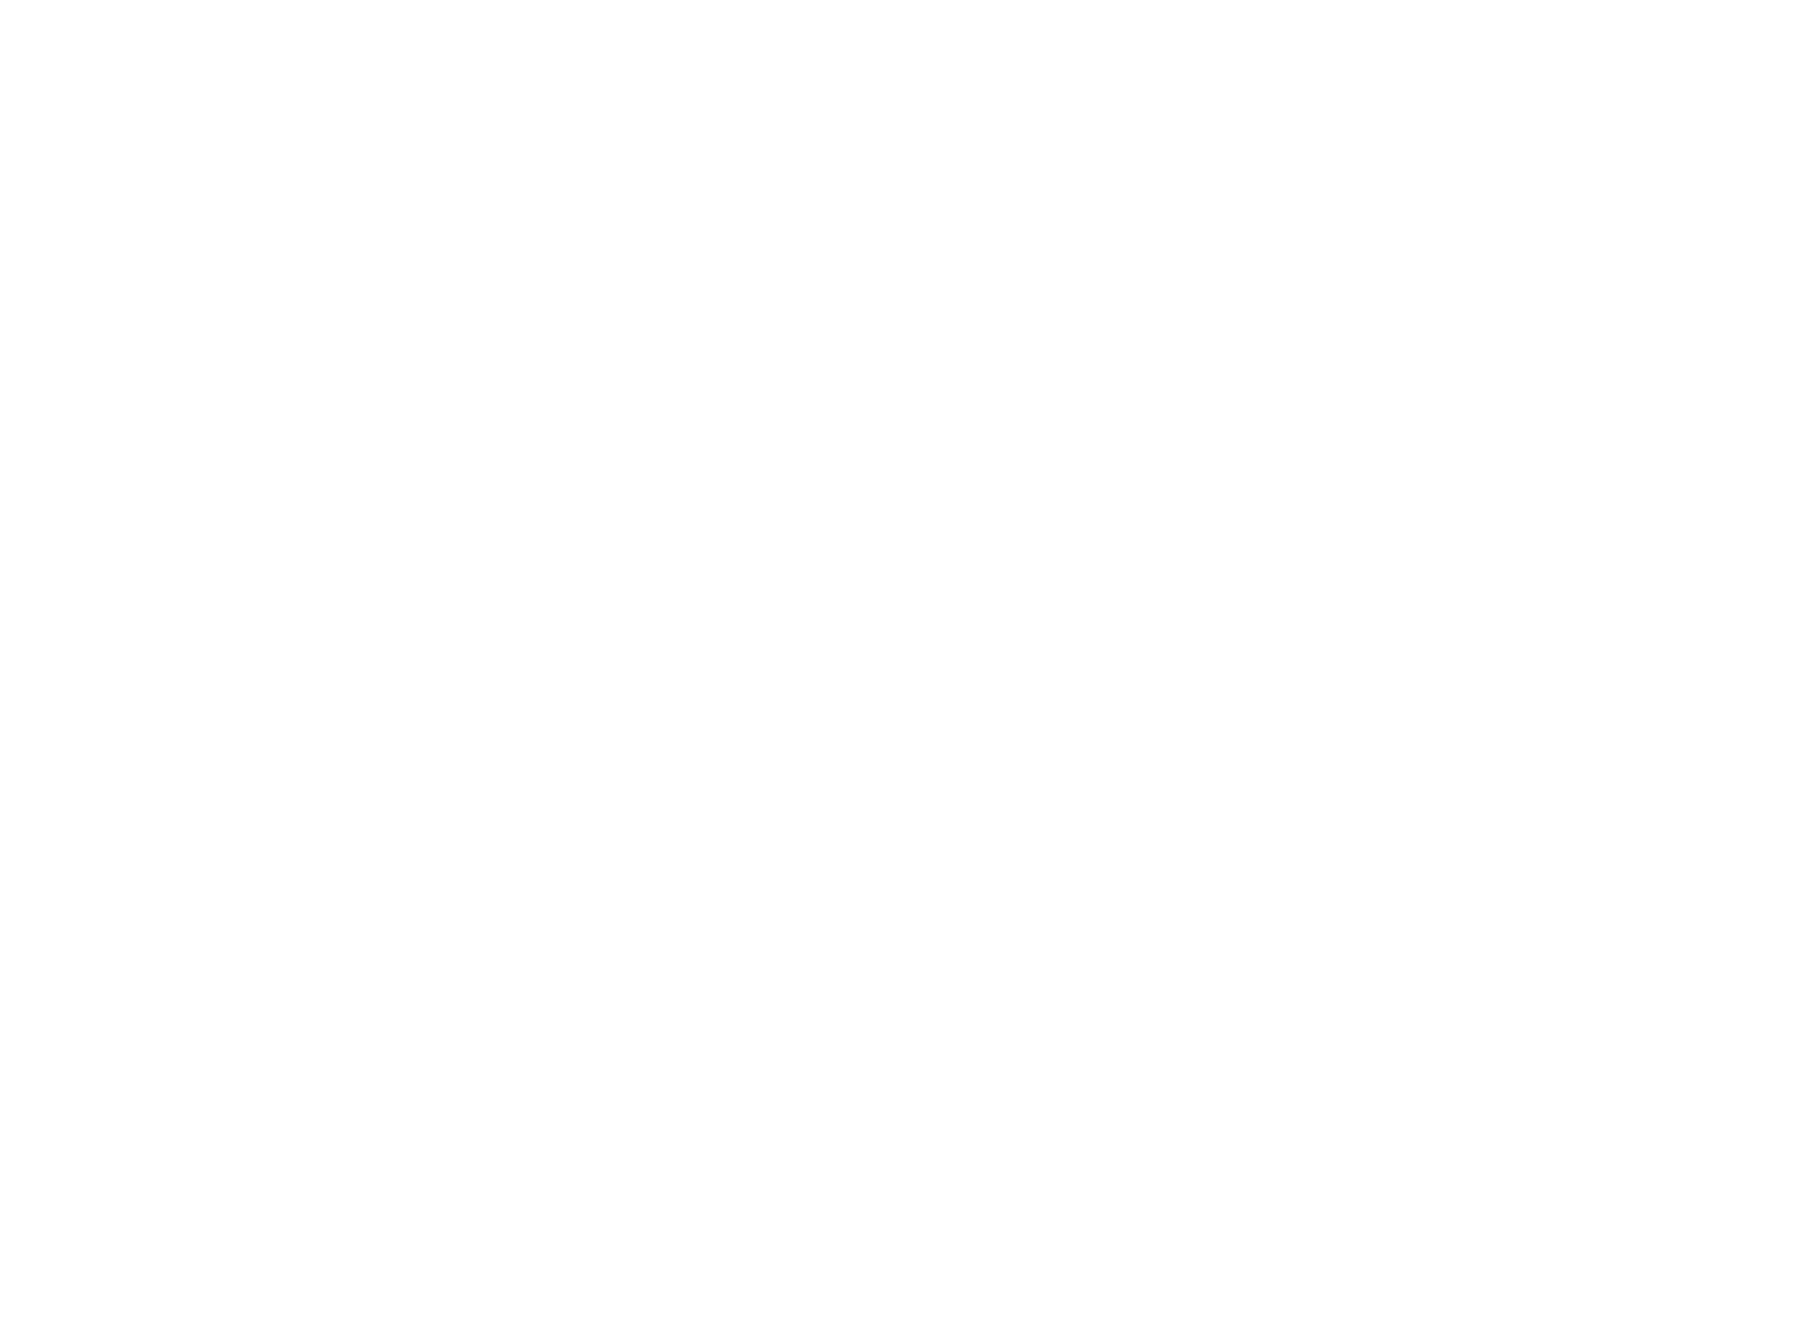 soc energy logo blanco.png